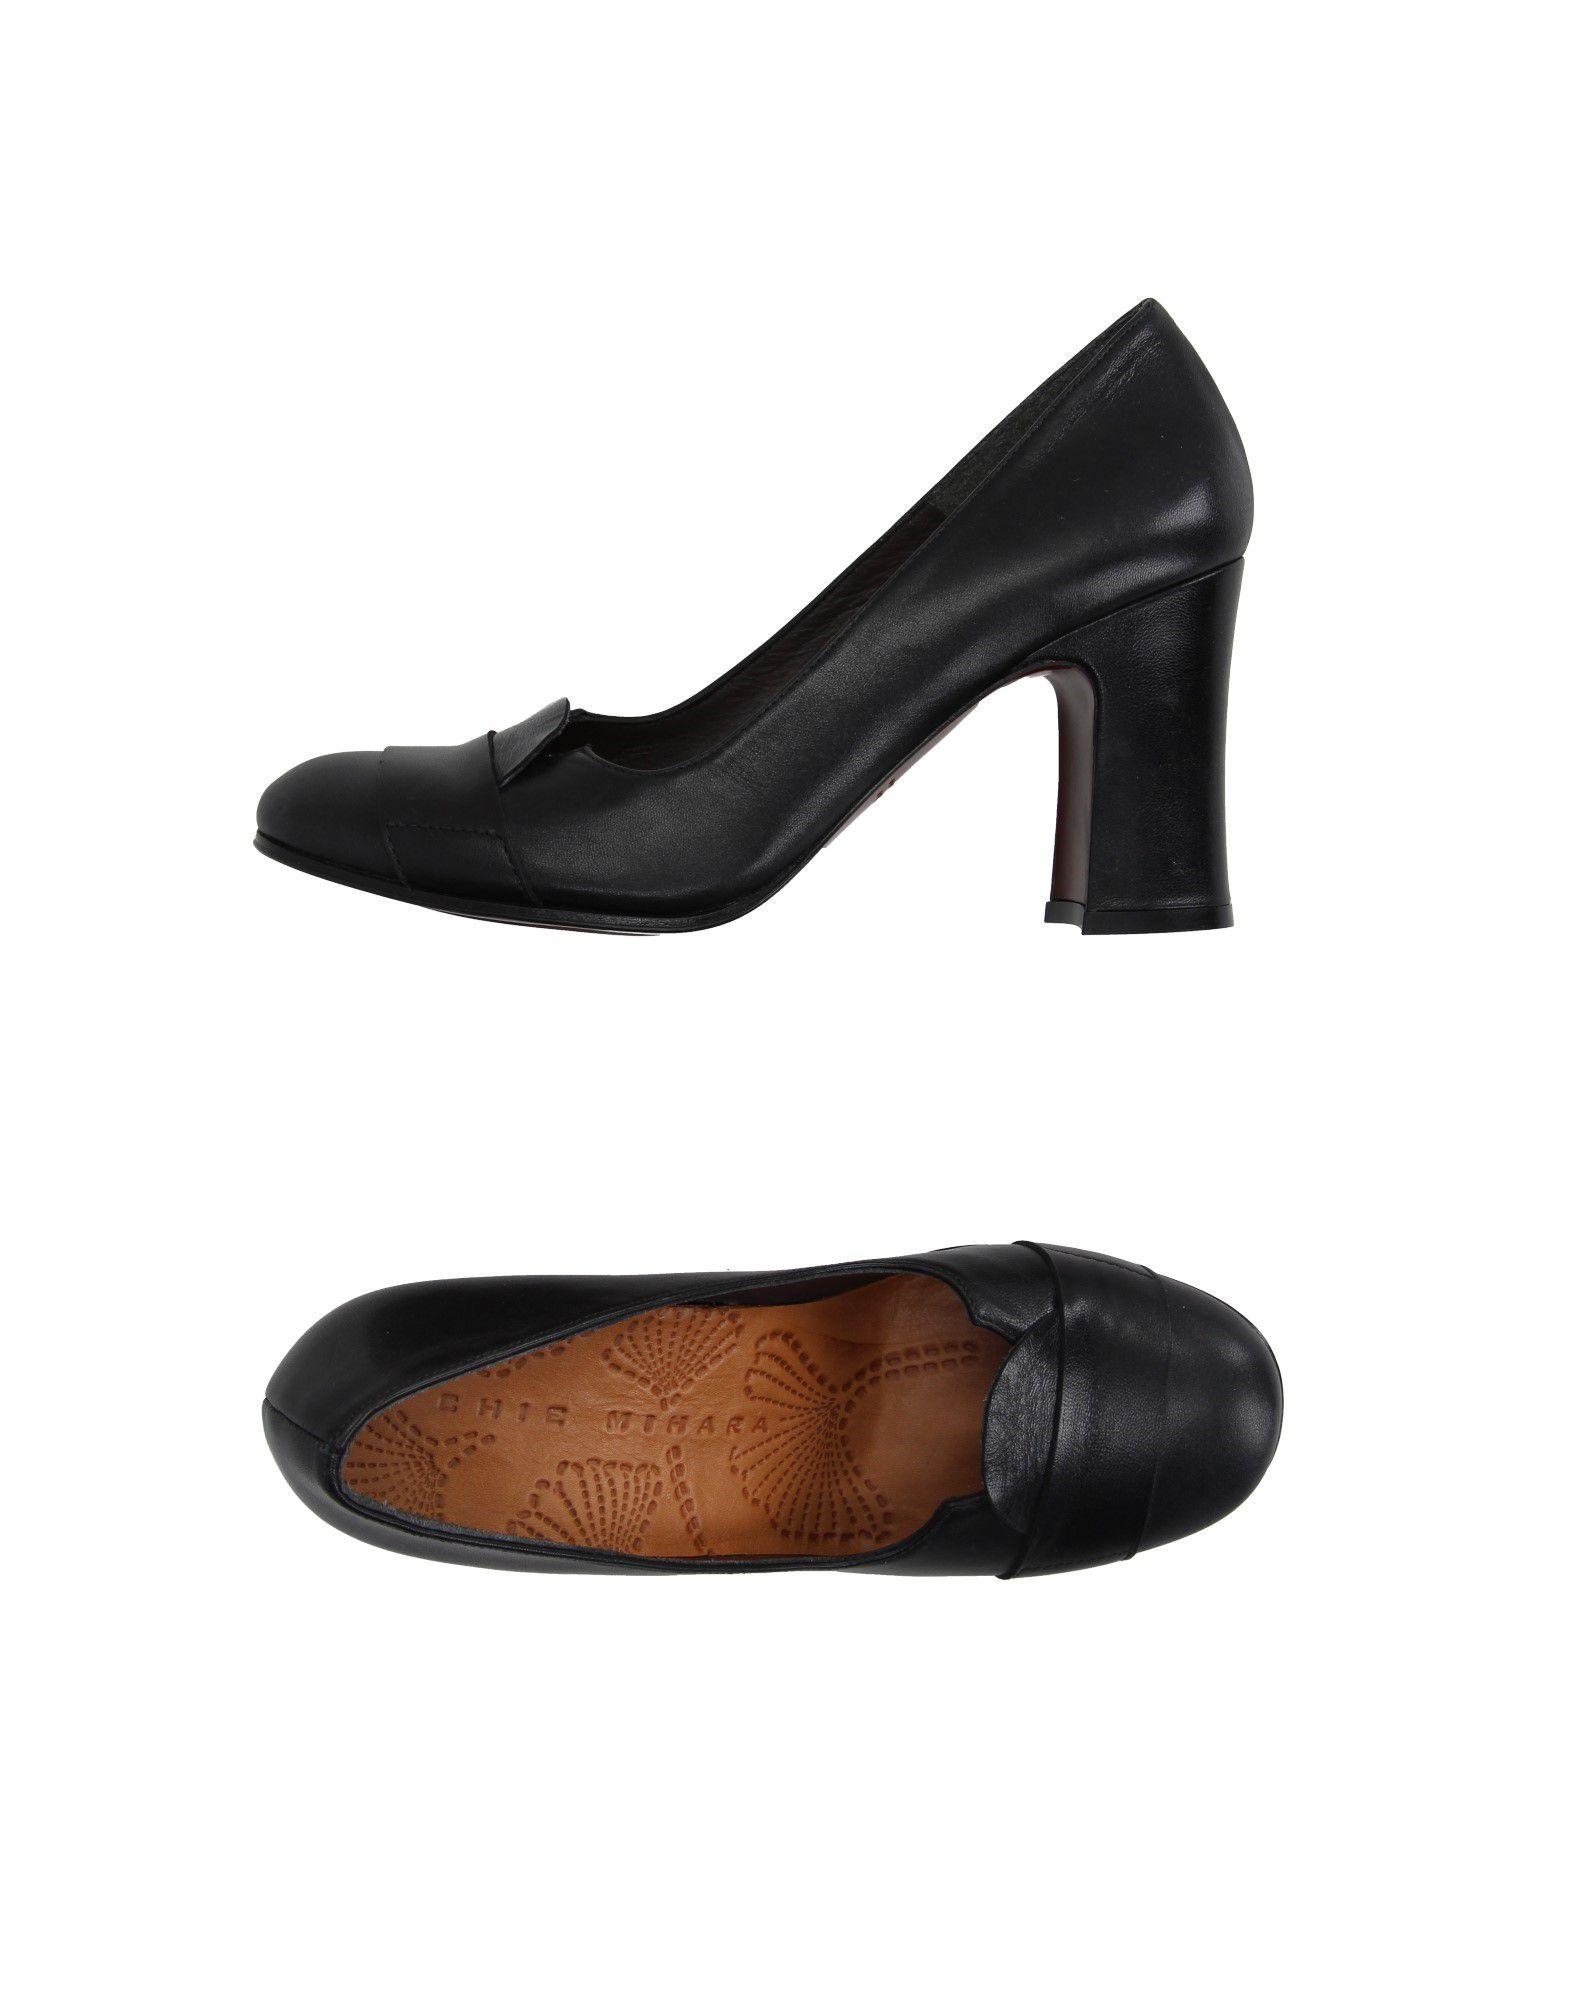 Stilvolle Mokassins billige Schuhe Chie Mihara Mokassins Stilvolle Damen  11020357AK 2e8258